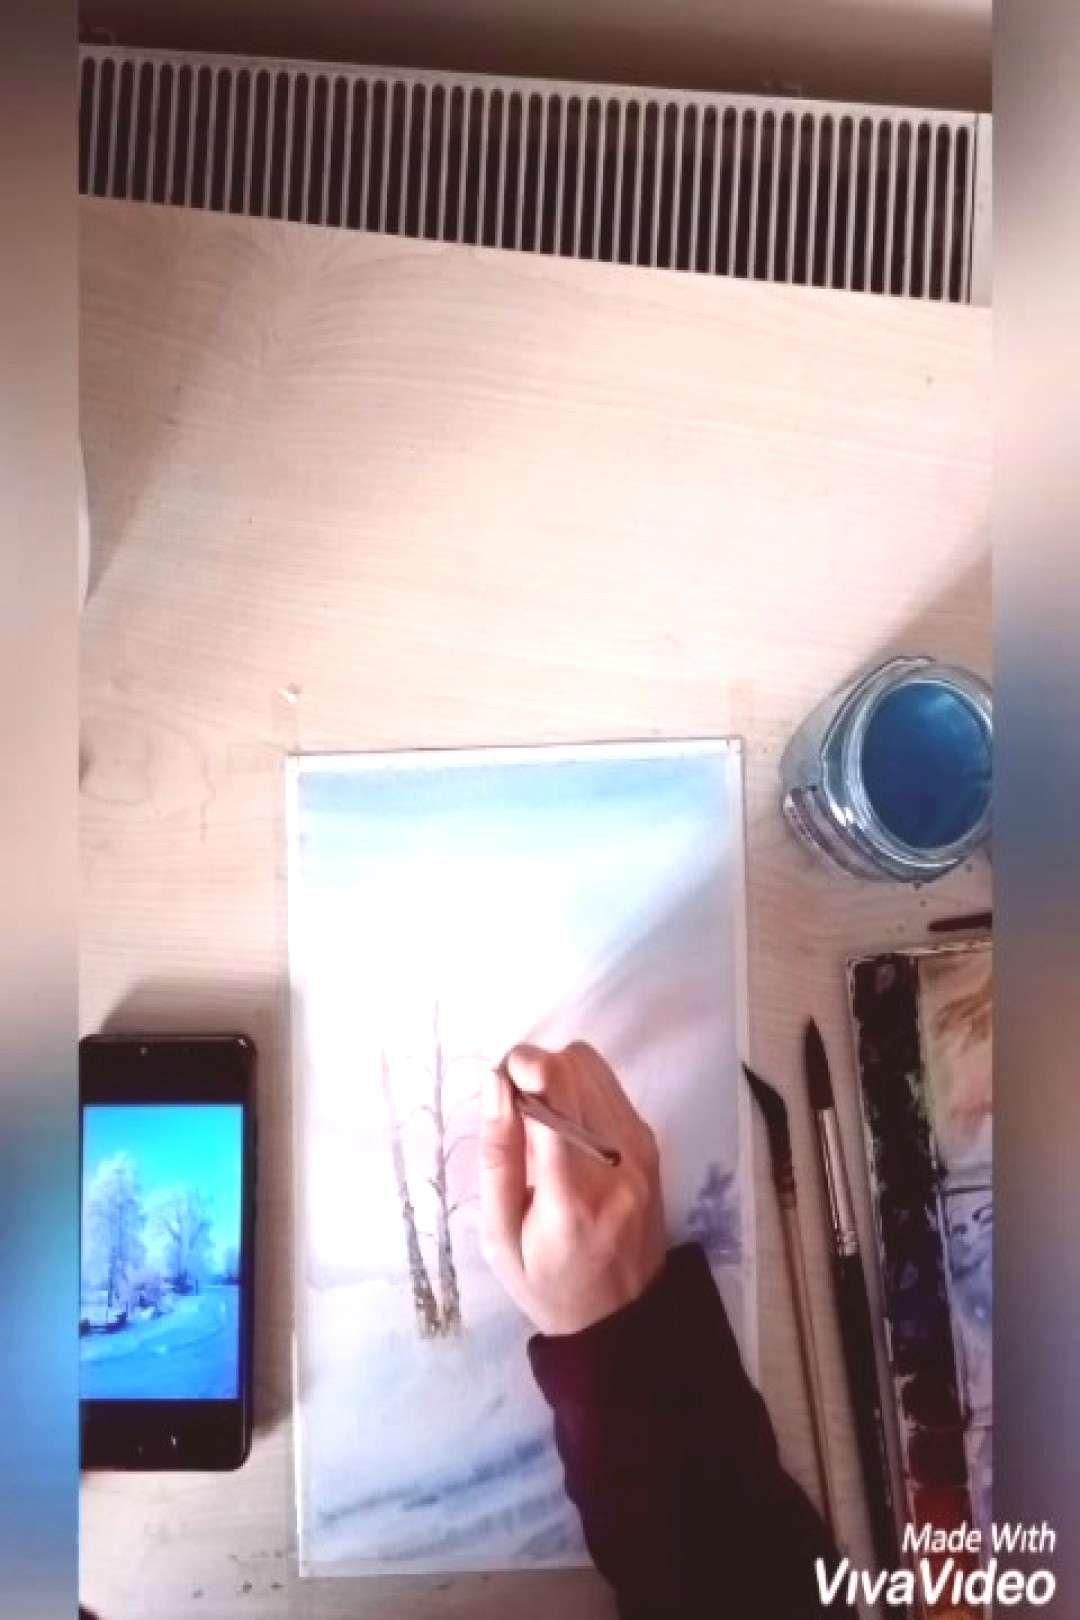 #watercolorlandscape #watercoloring #watercolor #gormezden #geliniz #lutfen #petei #wate Lutfen peteği gormezden geliniz #watercolor #watercoloring #wateYou can find Watercolor landscape and more on our website.Lutfe...